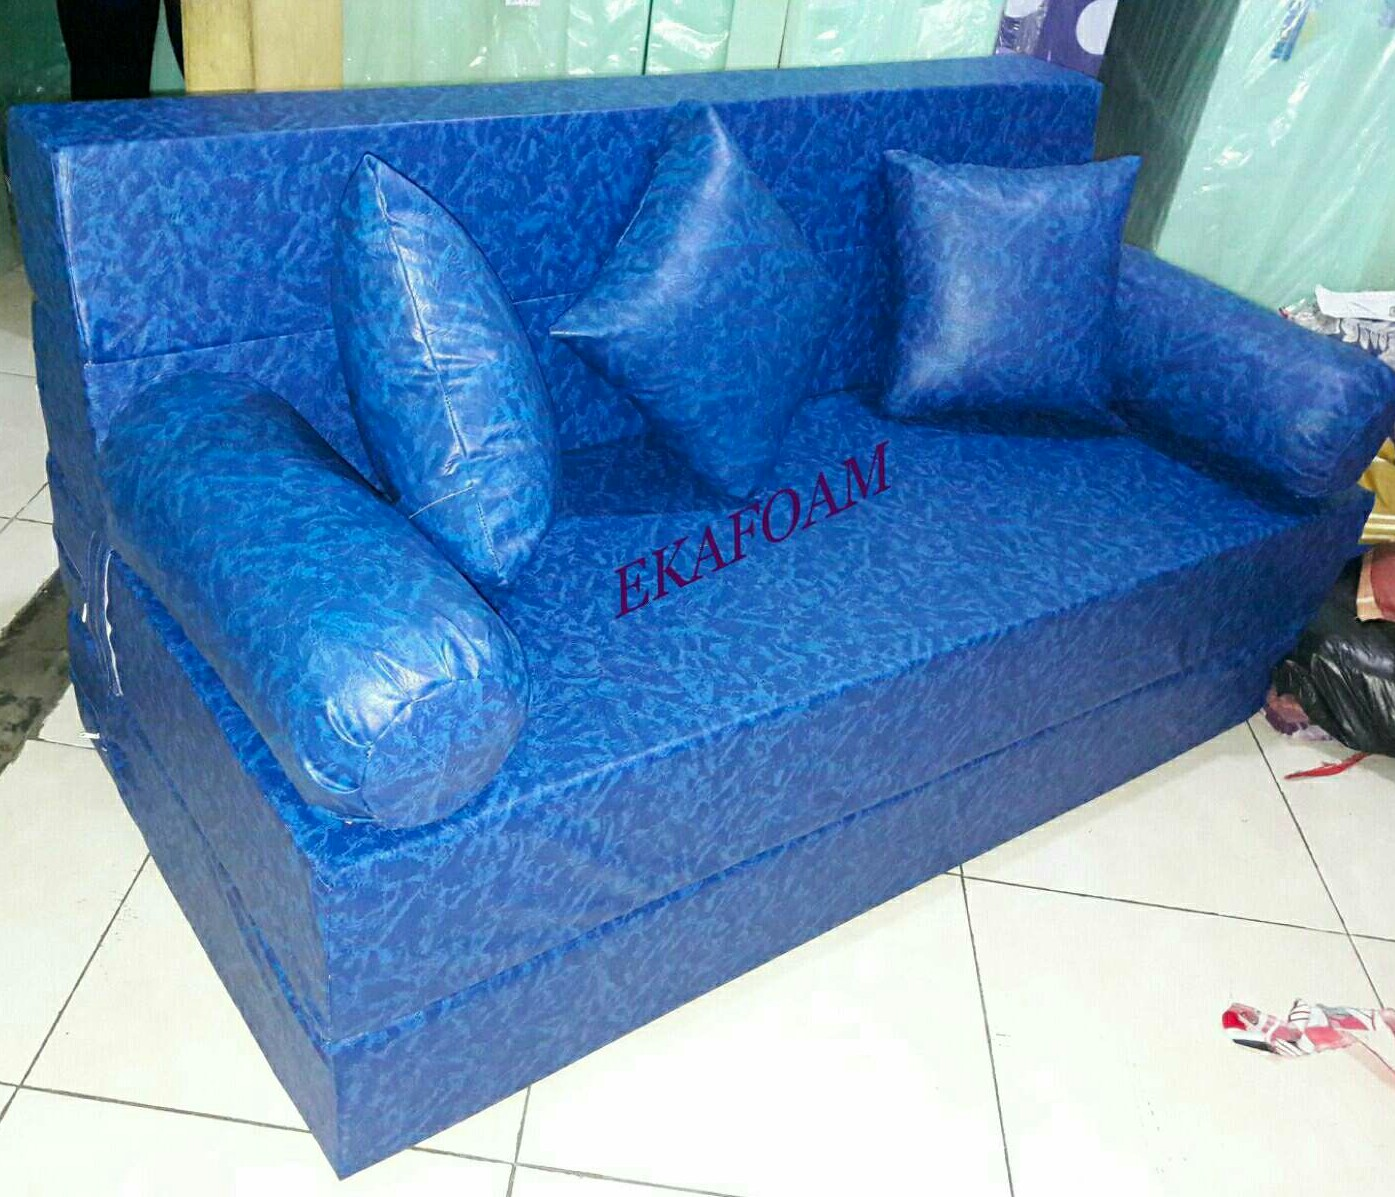 Harga Sofa Bed Inoac No 1 Reclining With Nailhead Trim Kasur Busa Terbaru 2018 Agen Resmi